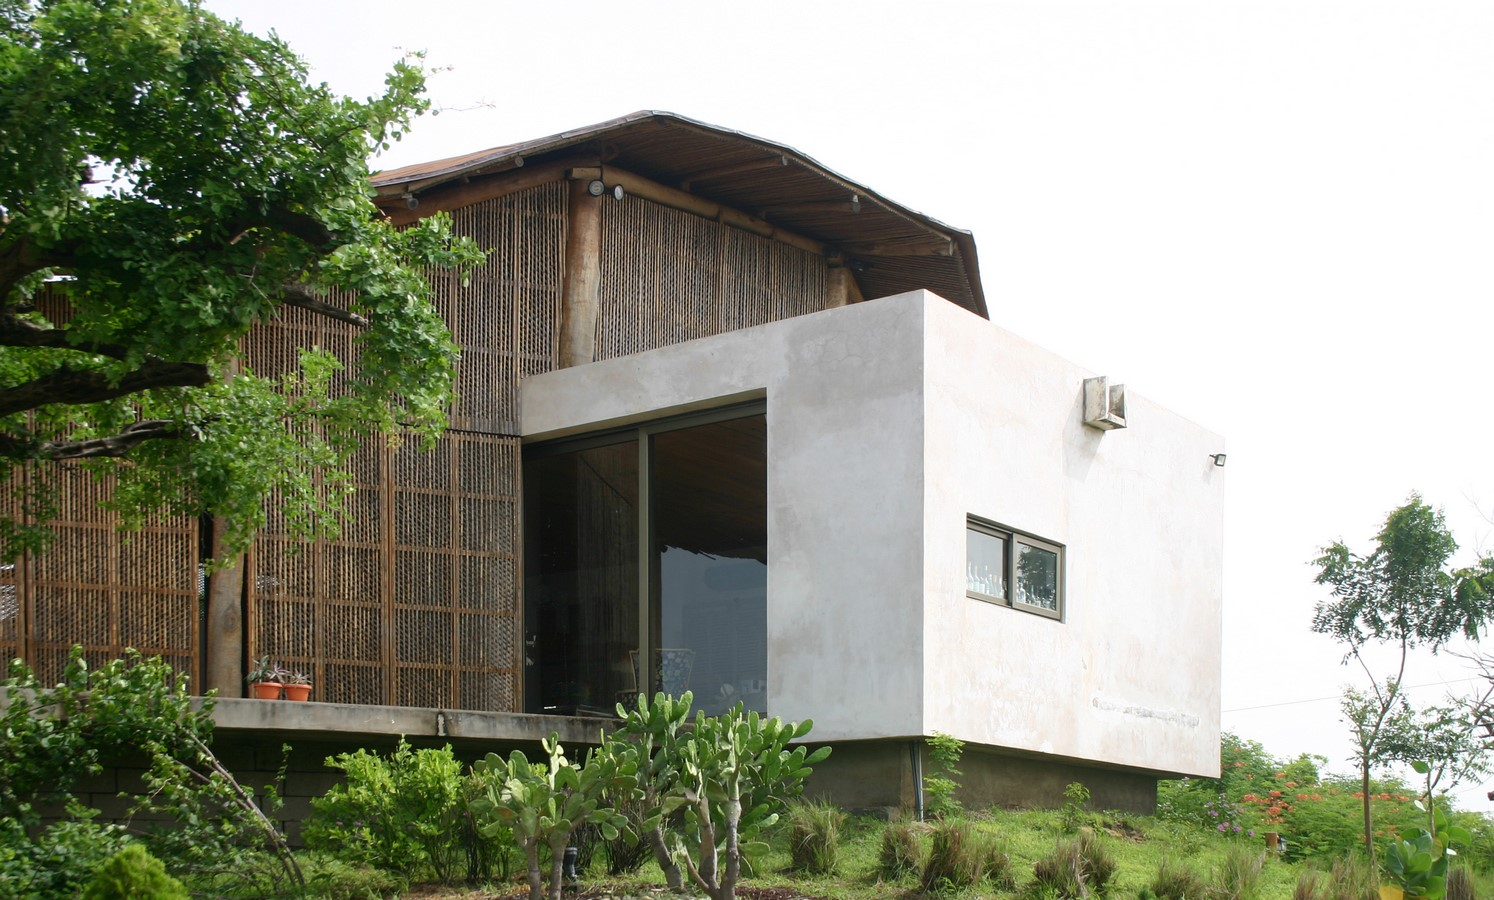 Coastal Nicaragua Homestead by Scalar Architecture - Sheet2